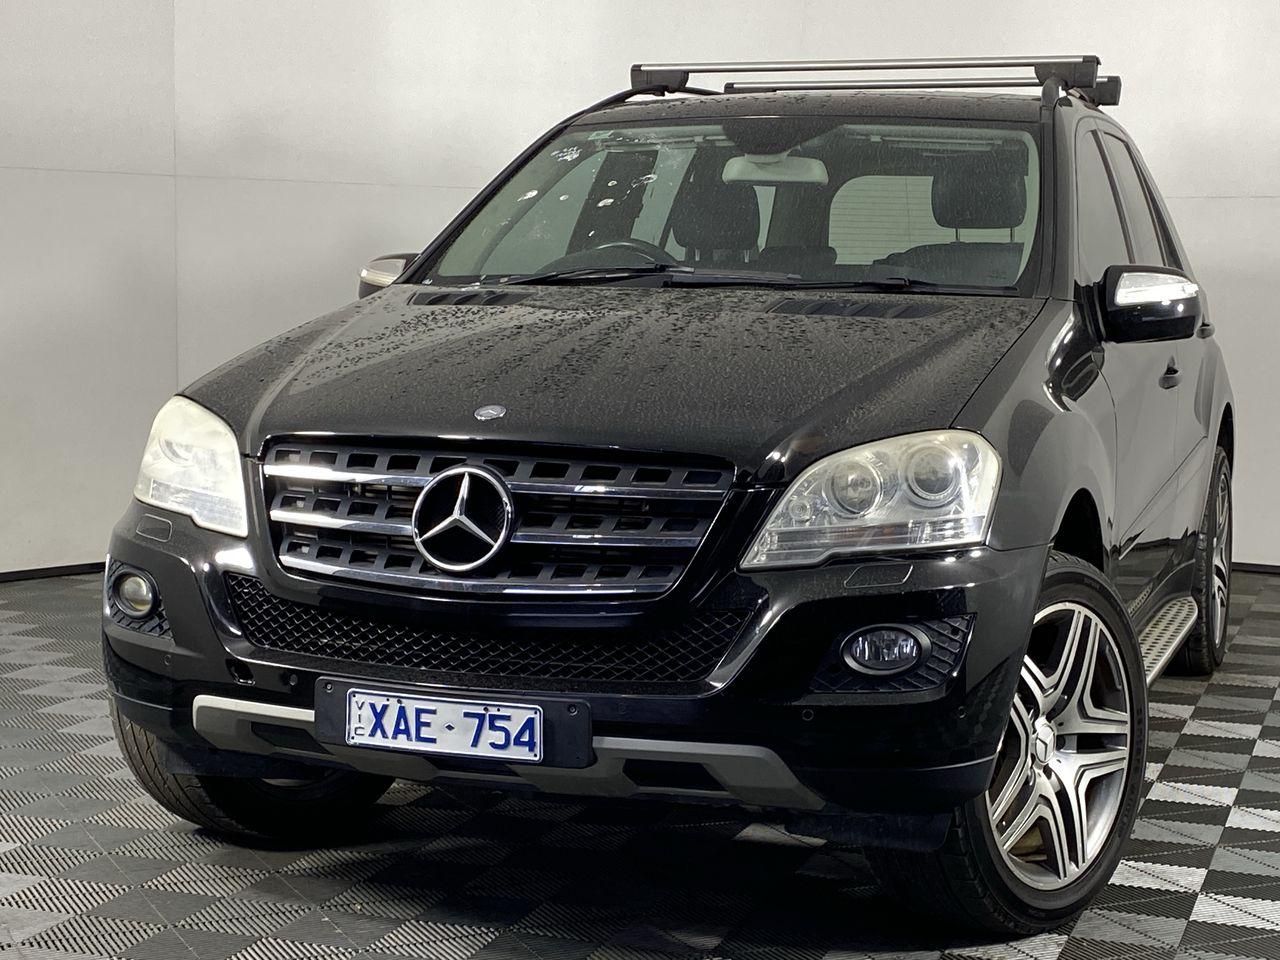 2009 Mercedes Benz ML280 CDI Automatic SUV